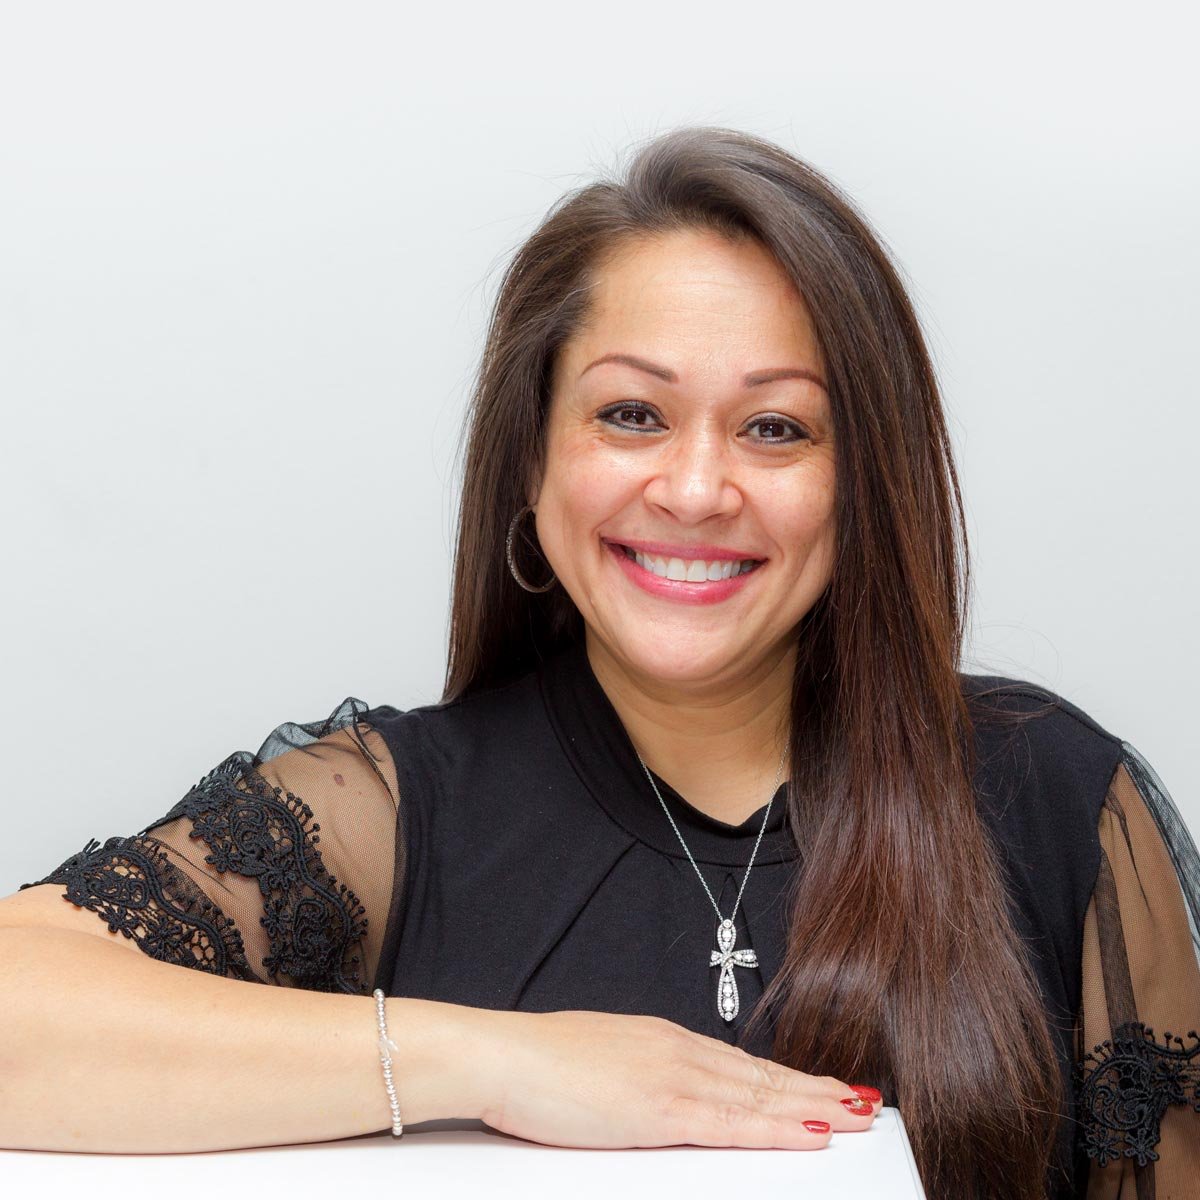 Sharon Agcaoili